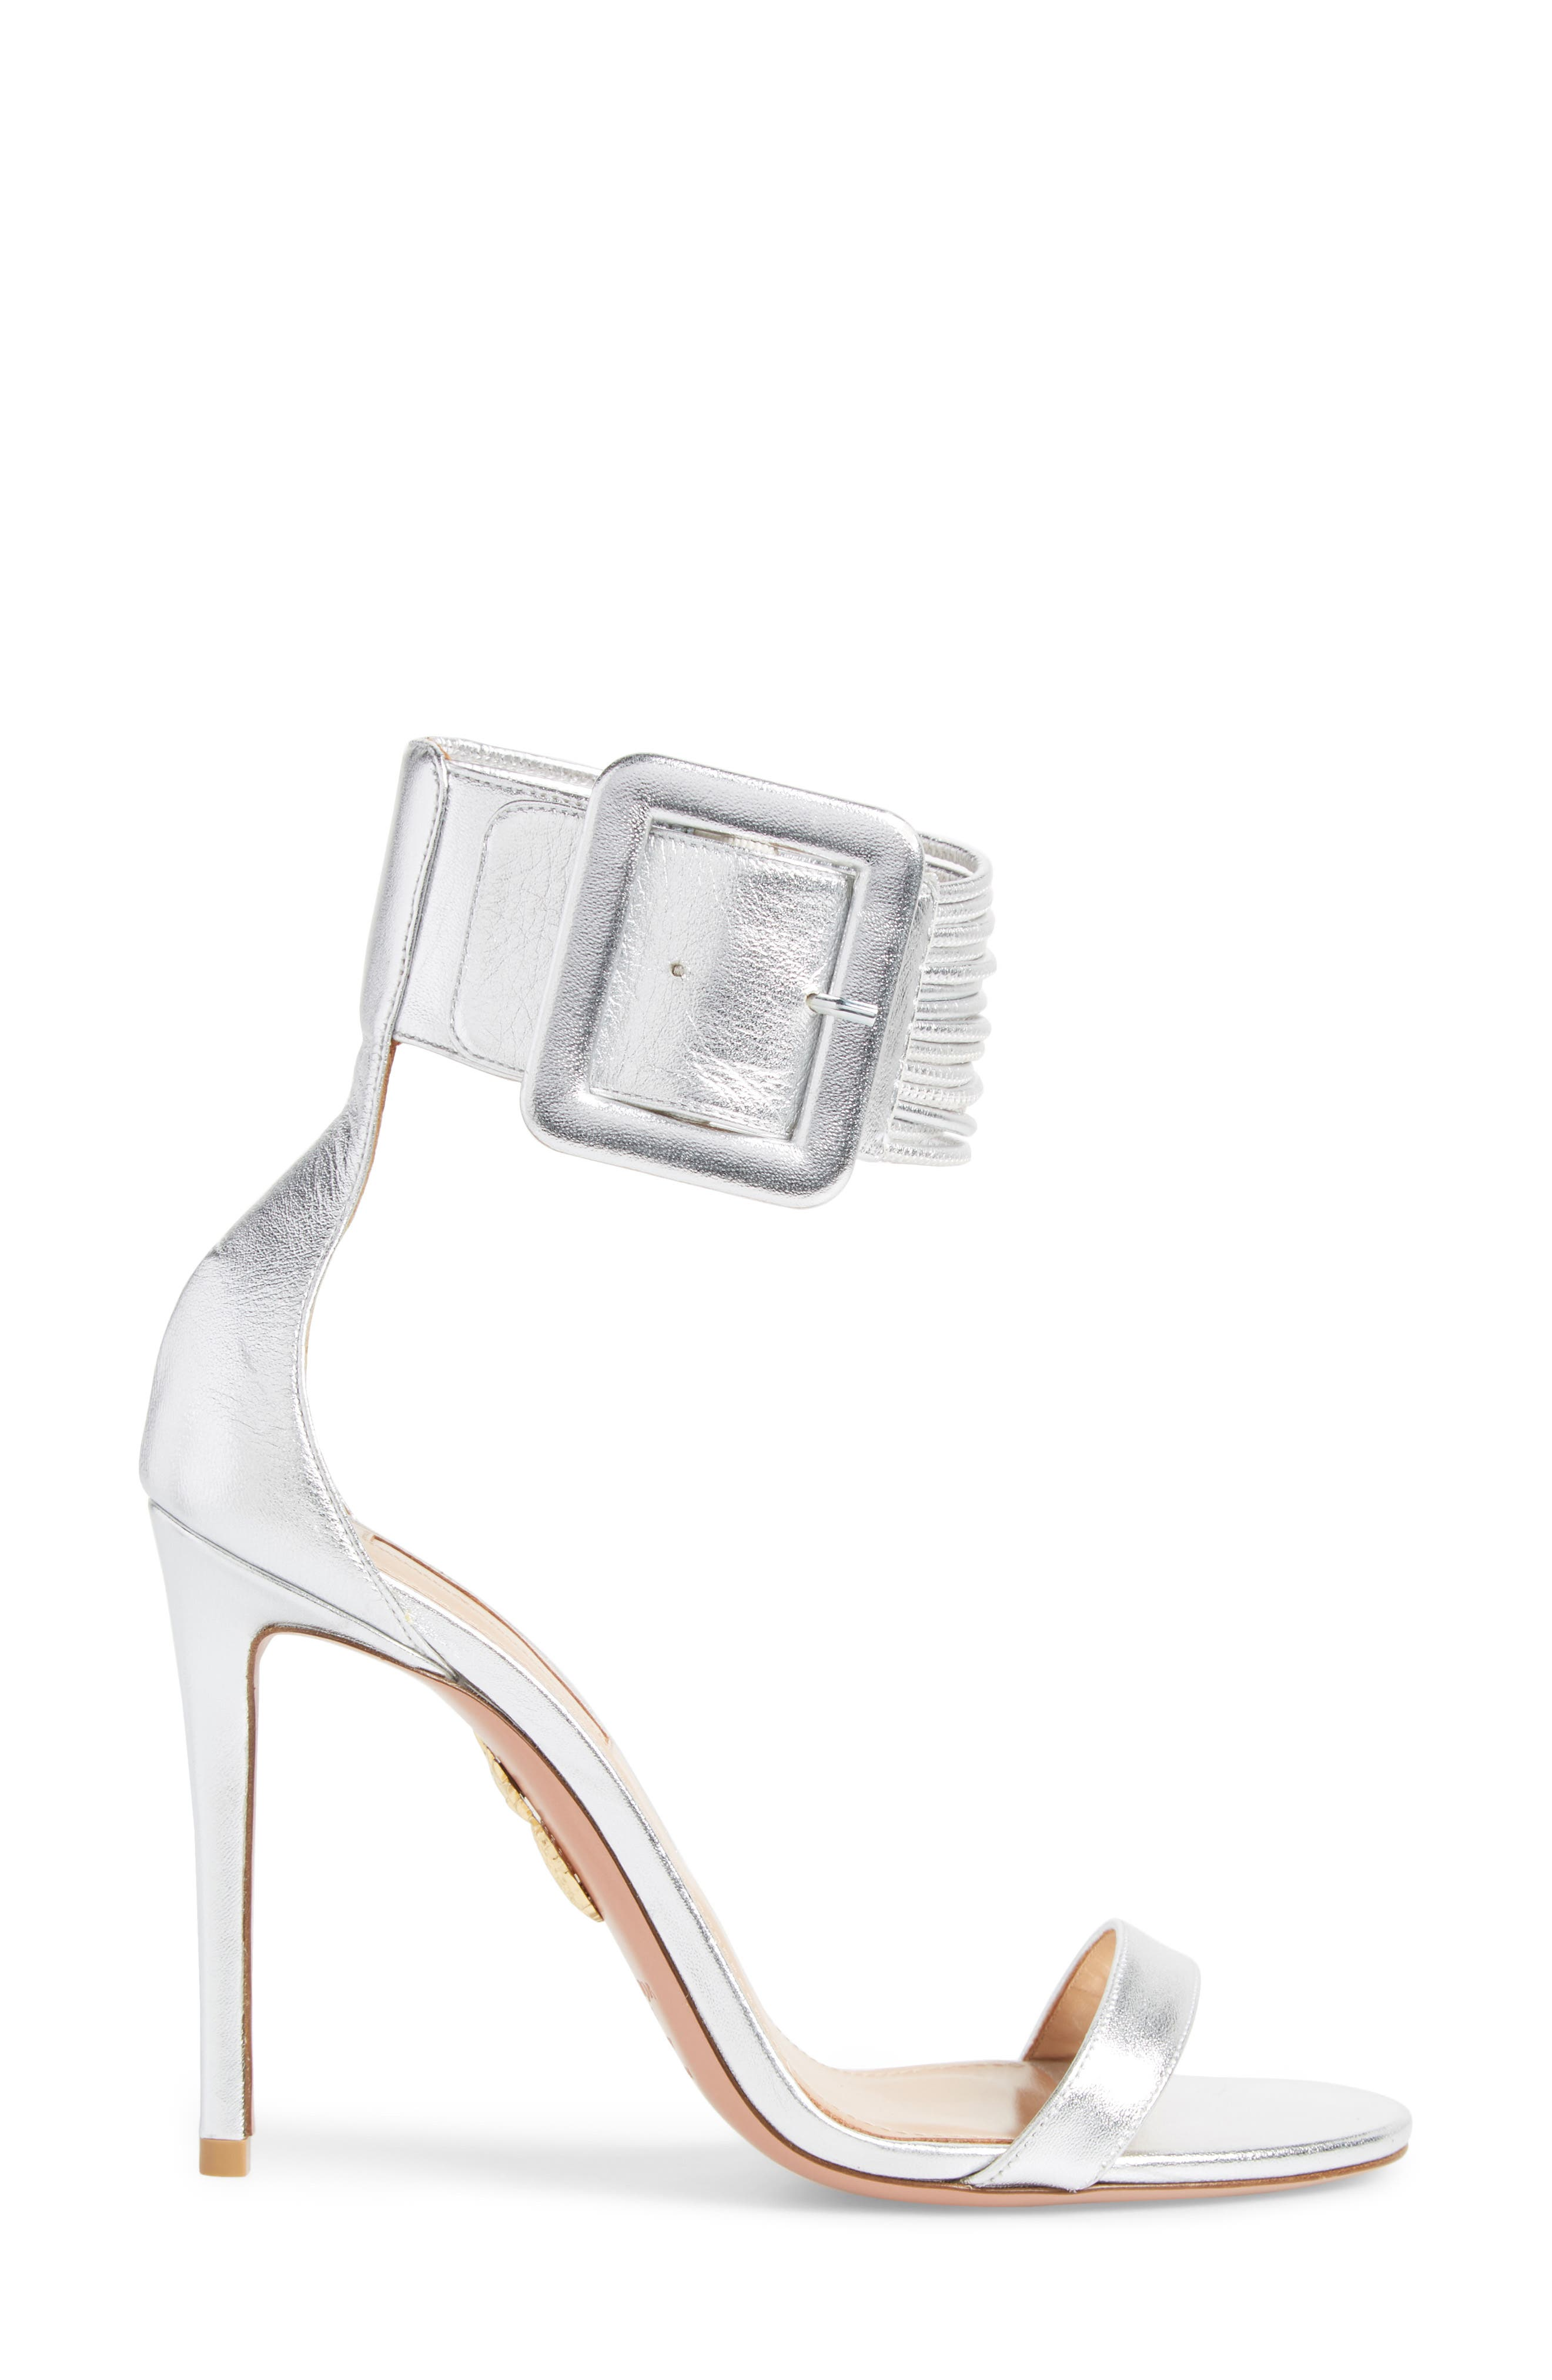 Casablanca Ankle Cuff Sandal,                             Alternate thumbnail 3, color,                             Silver